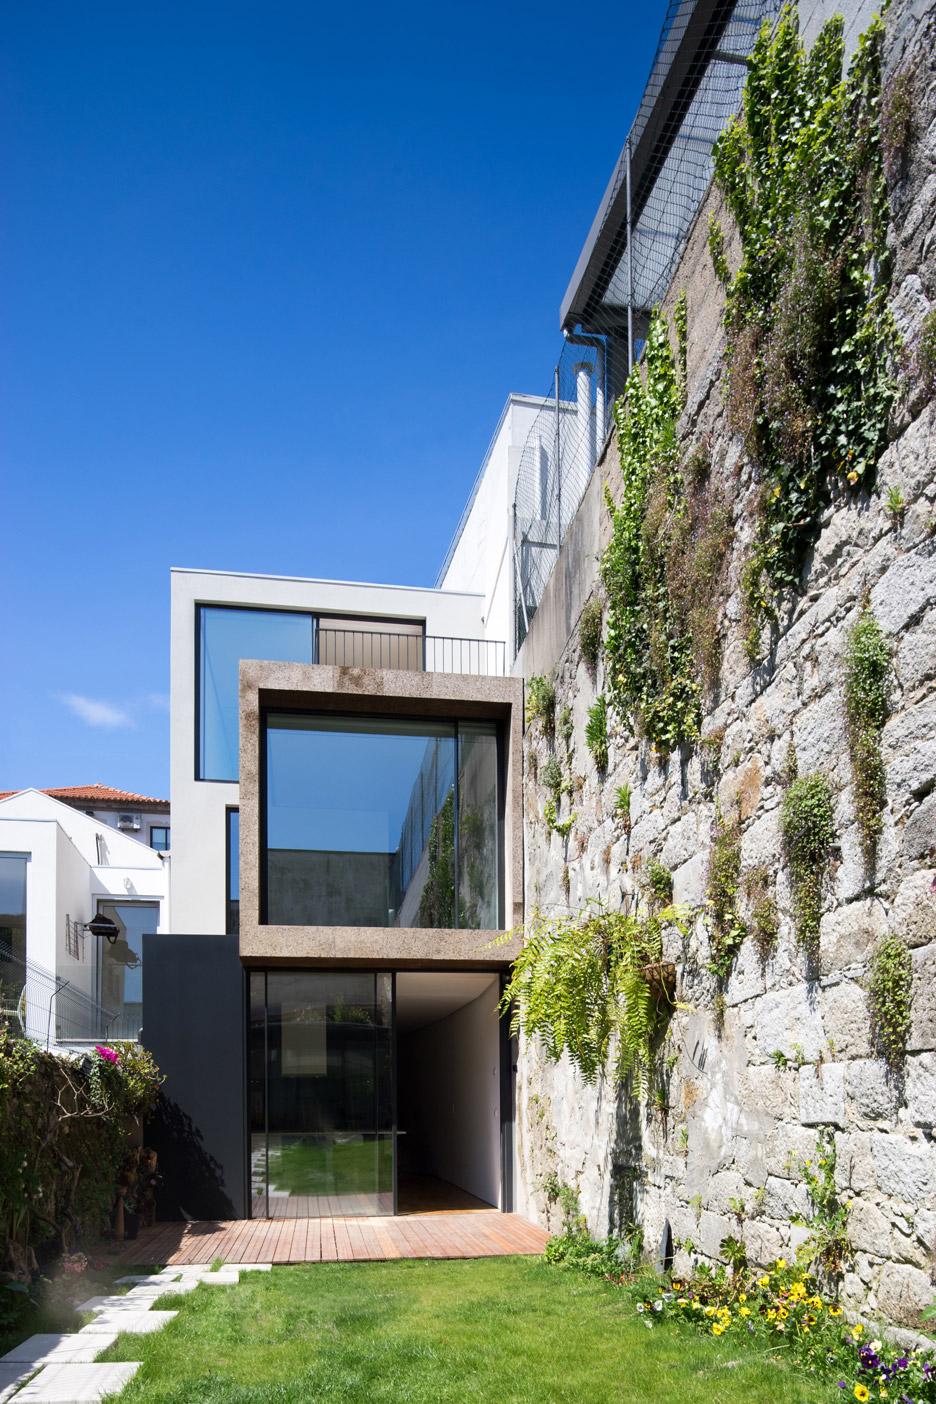 Casa Bonjardim was designed by Porto studio ATKA Arquitectos